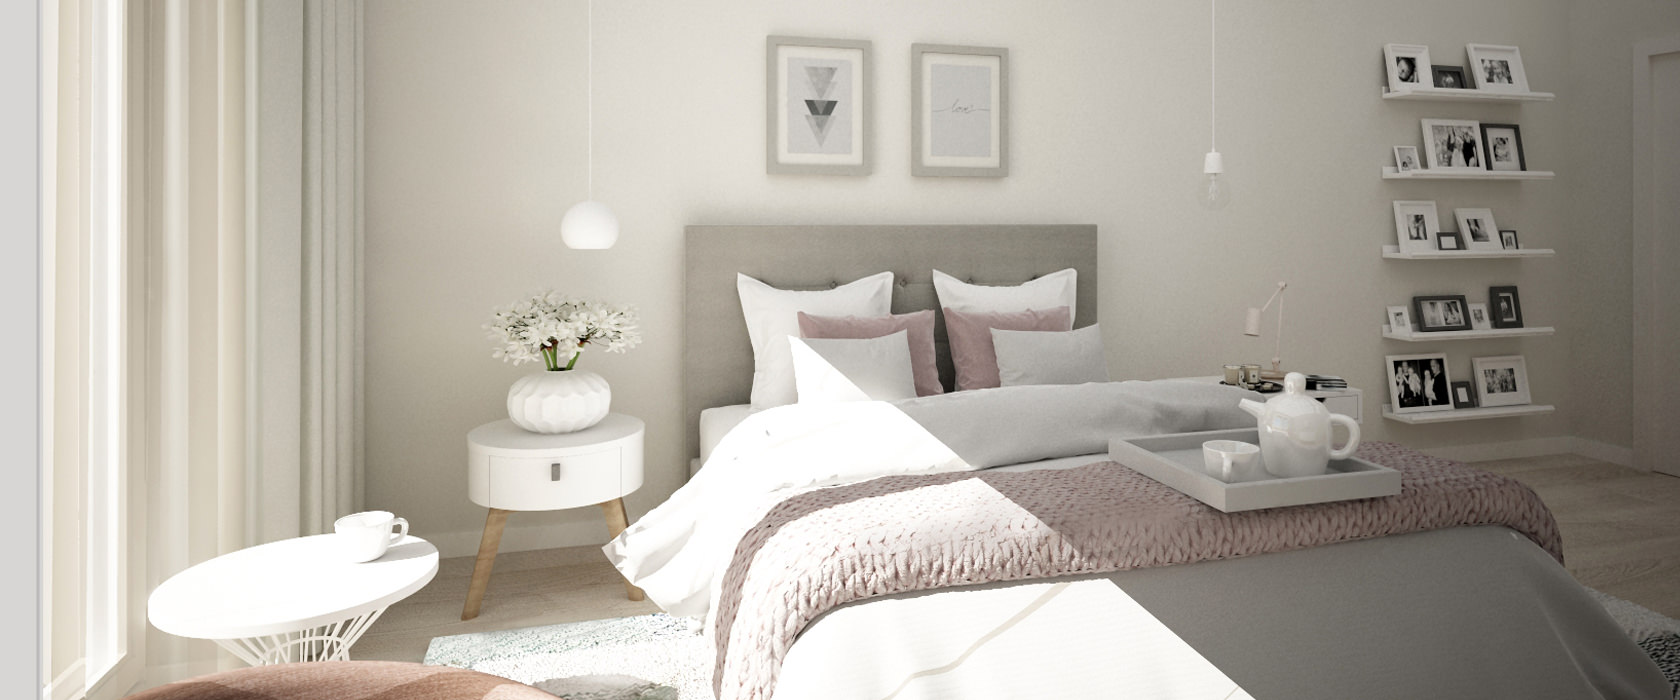 Ліжко Ferrara - Фото 1 - Pufetto